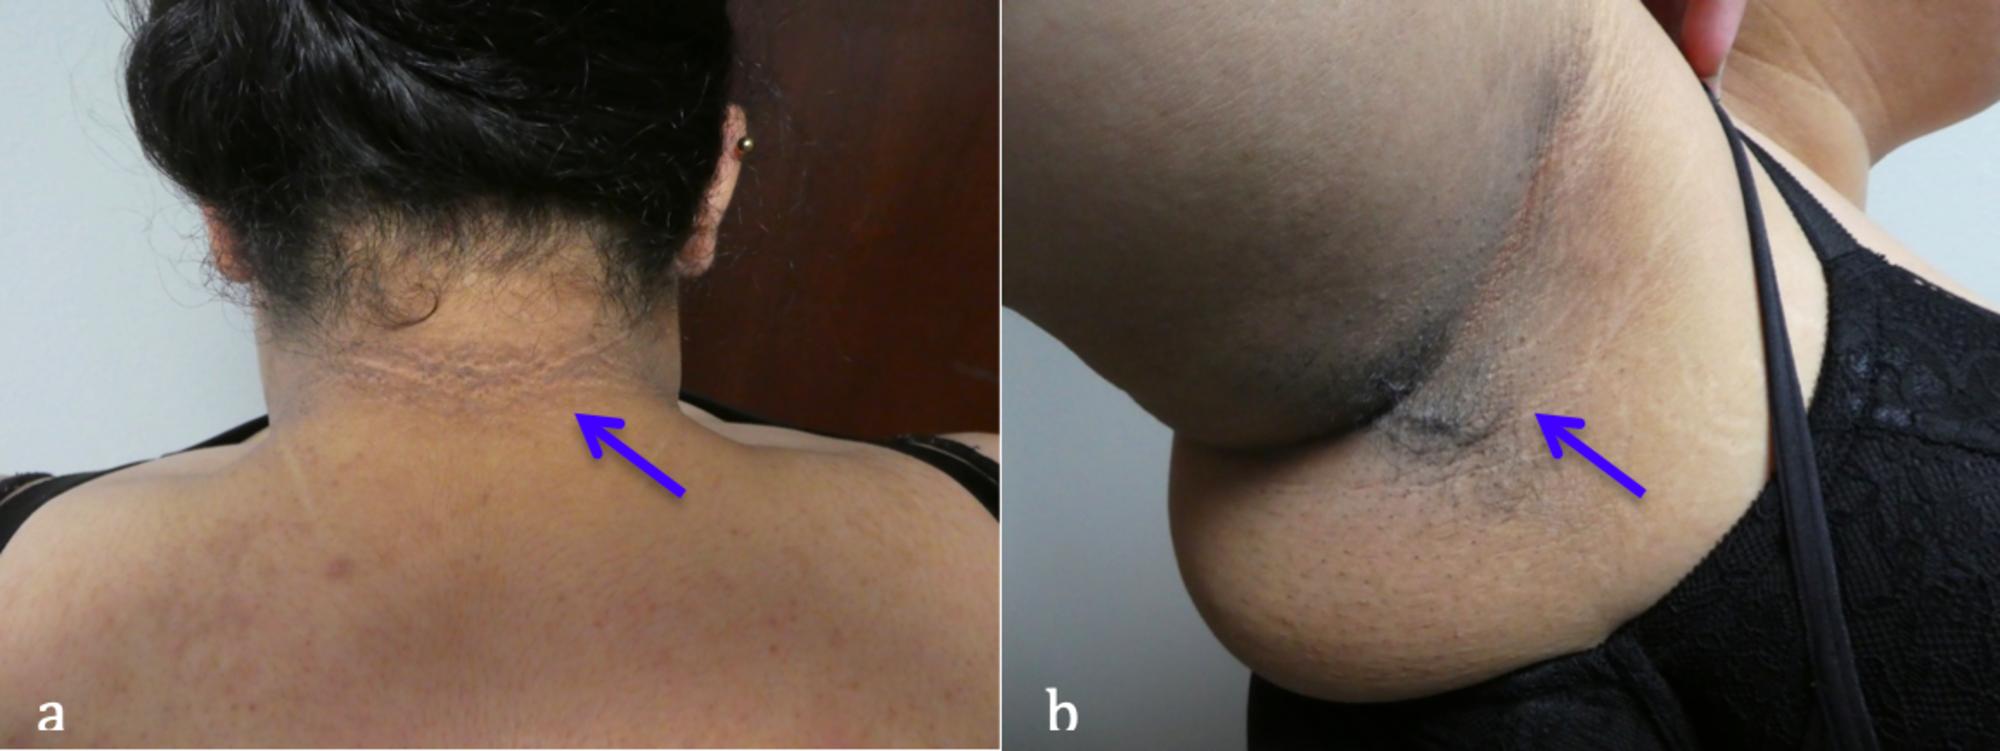 ductal papilloma lump papilloma virus tumore vescicale